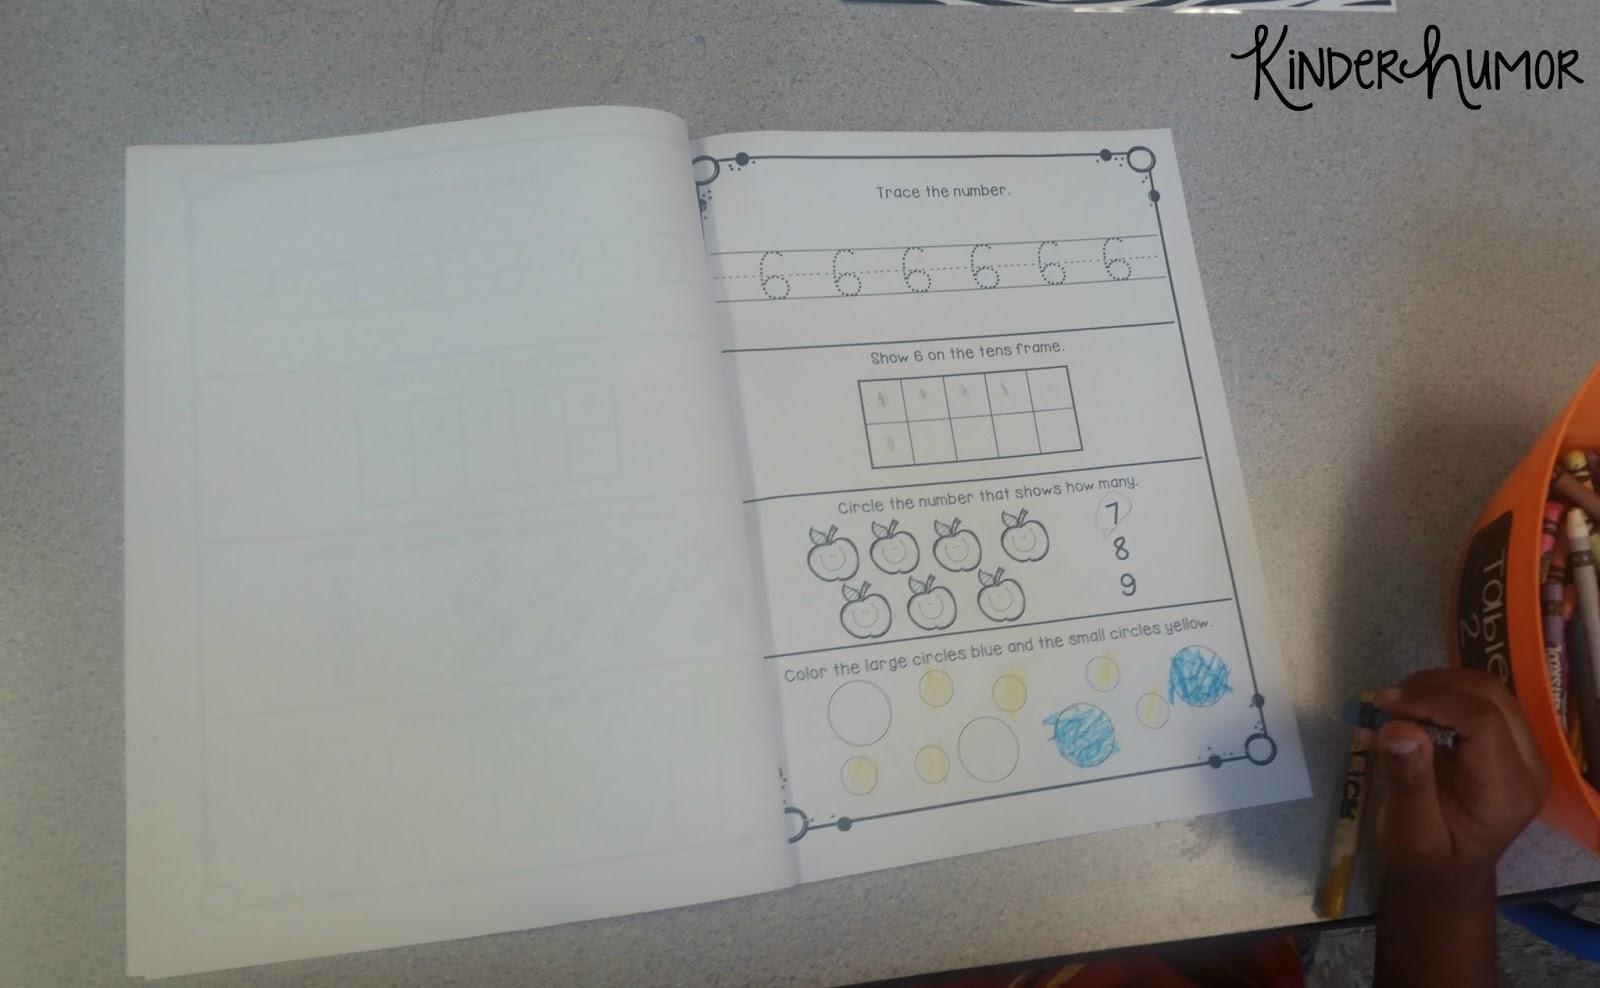 Kinder Humor Daily Spiral Math Review In Kindergarten